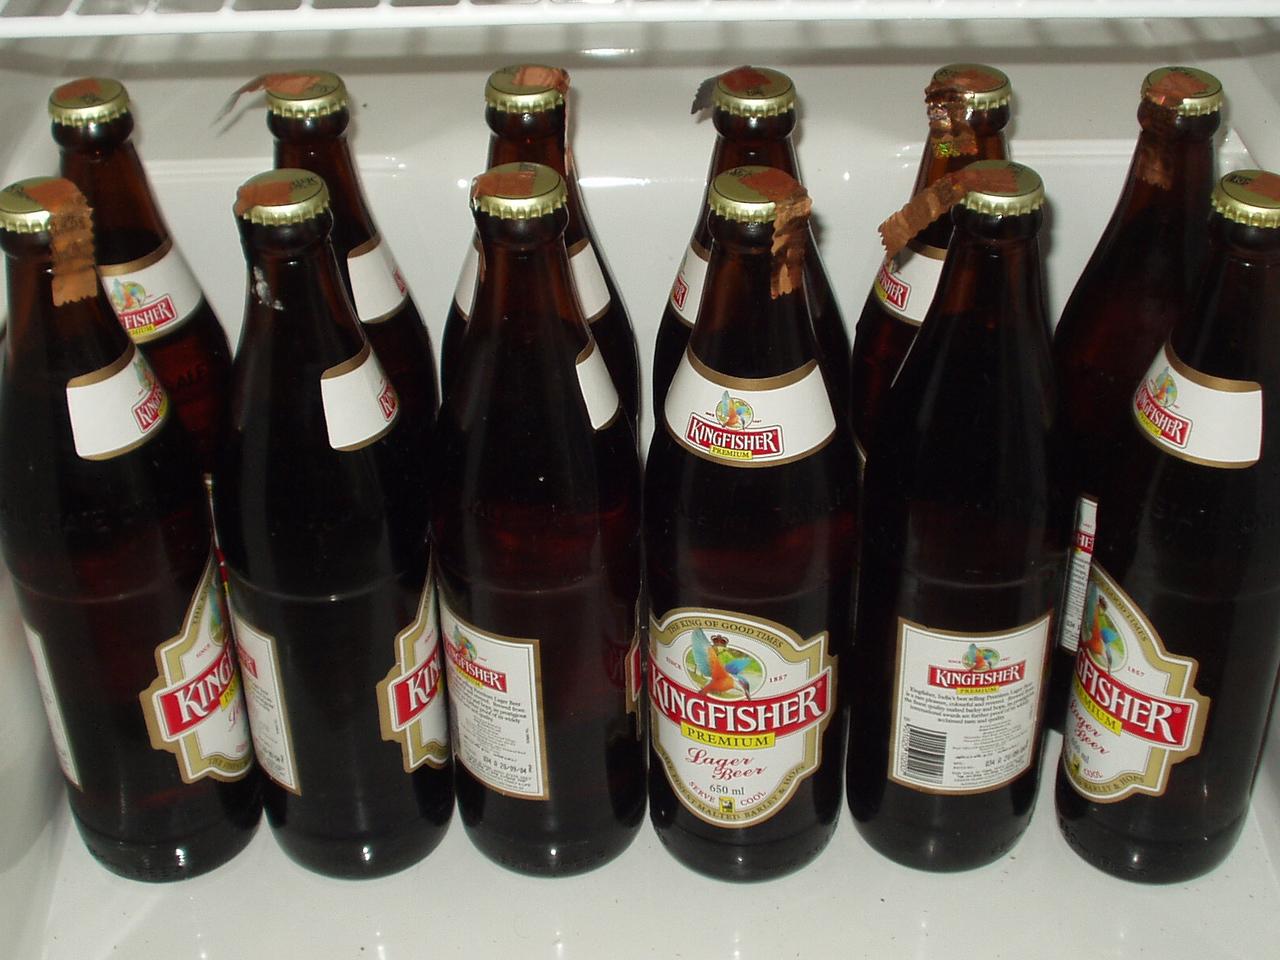 15 October: Free beer